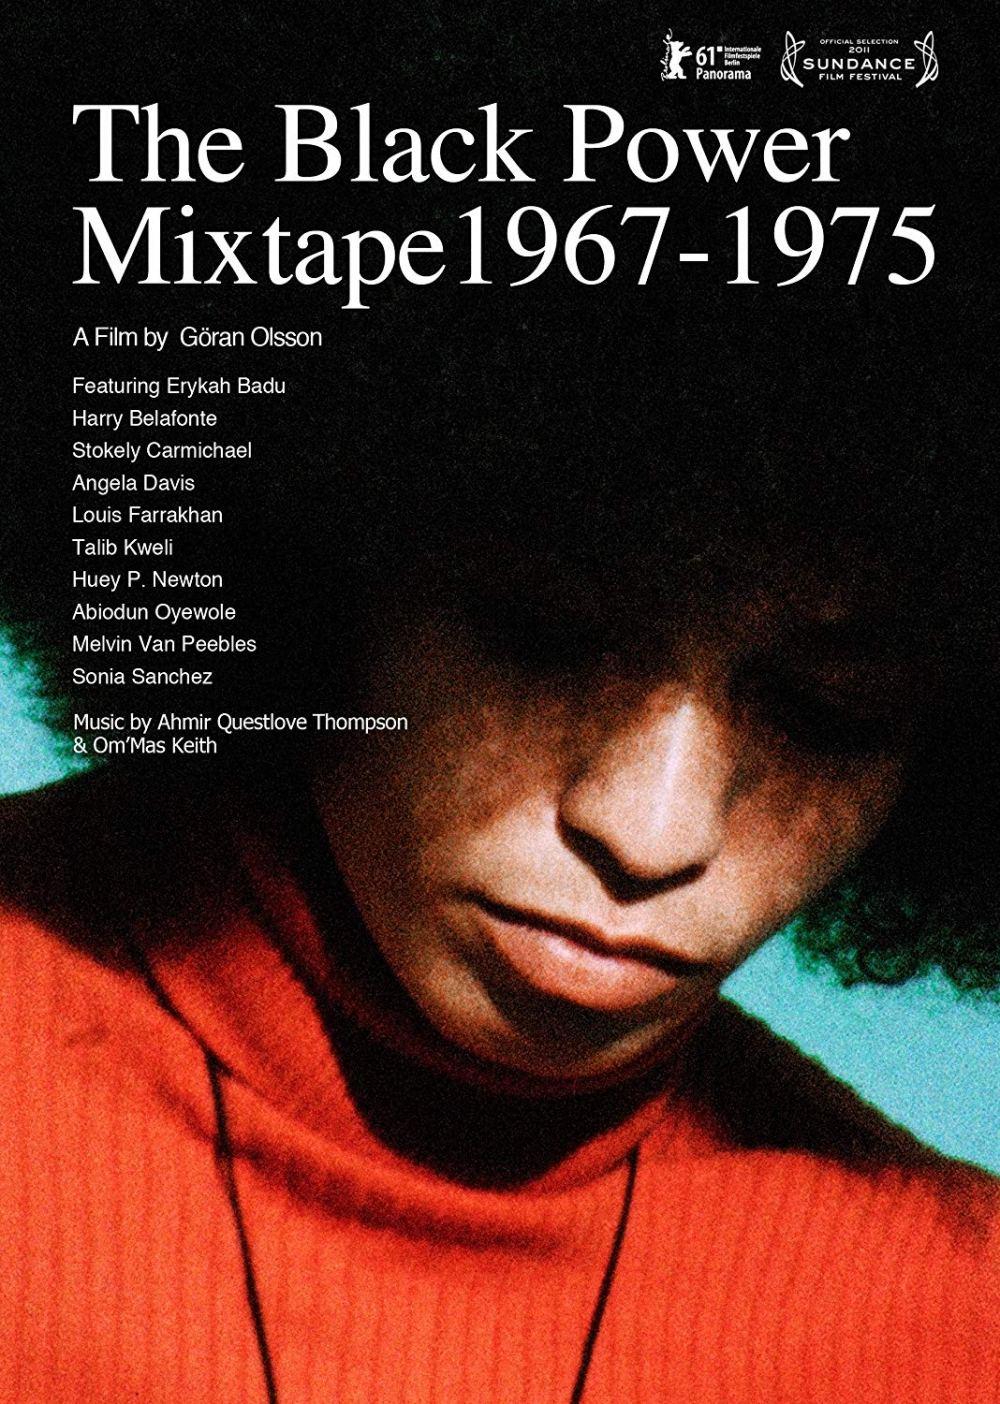 Black Power Mixtape 1967 - 1975